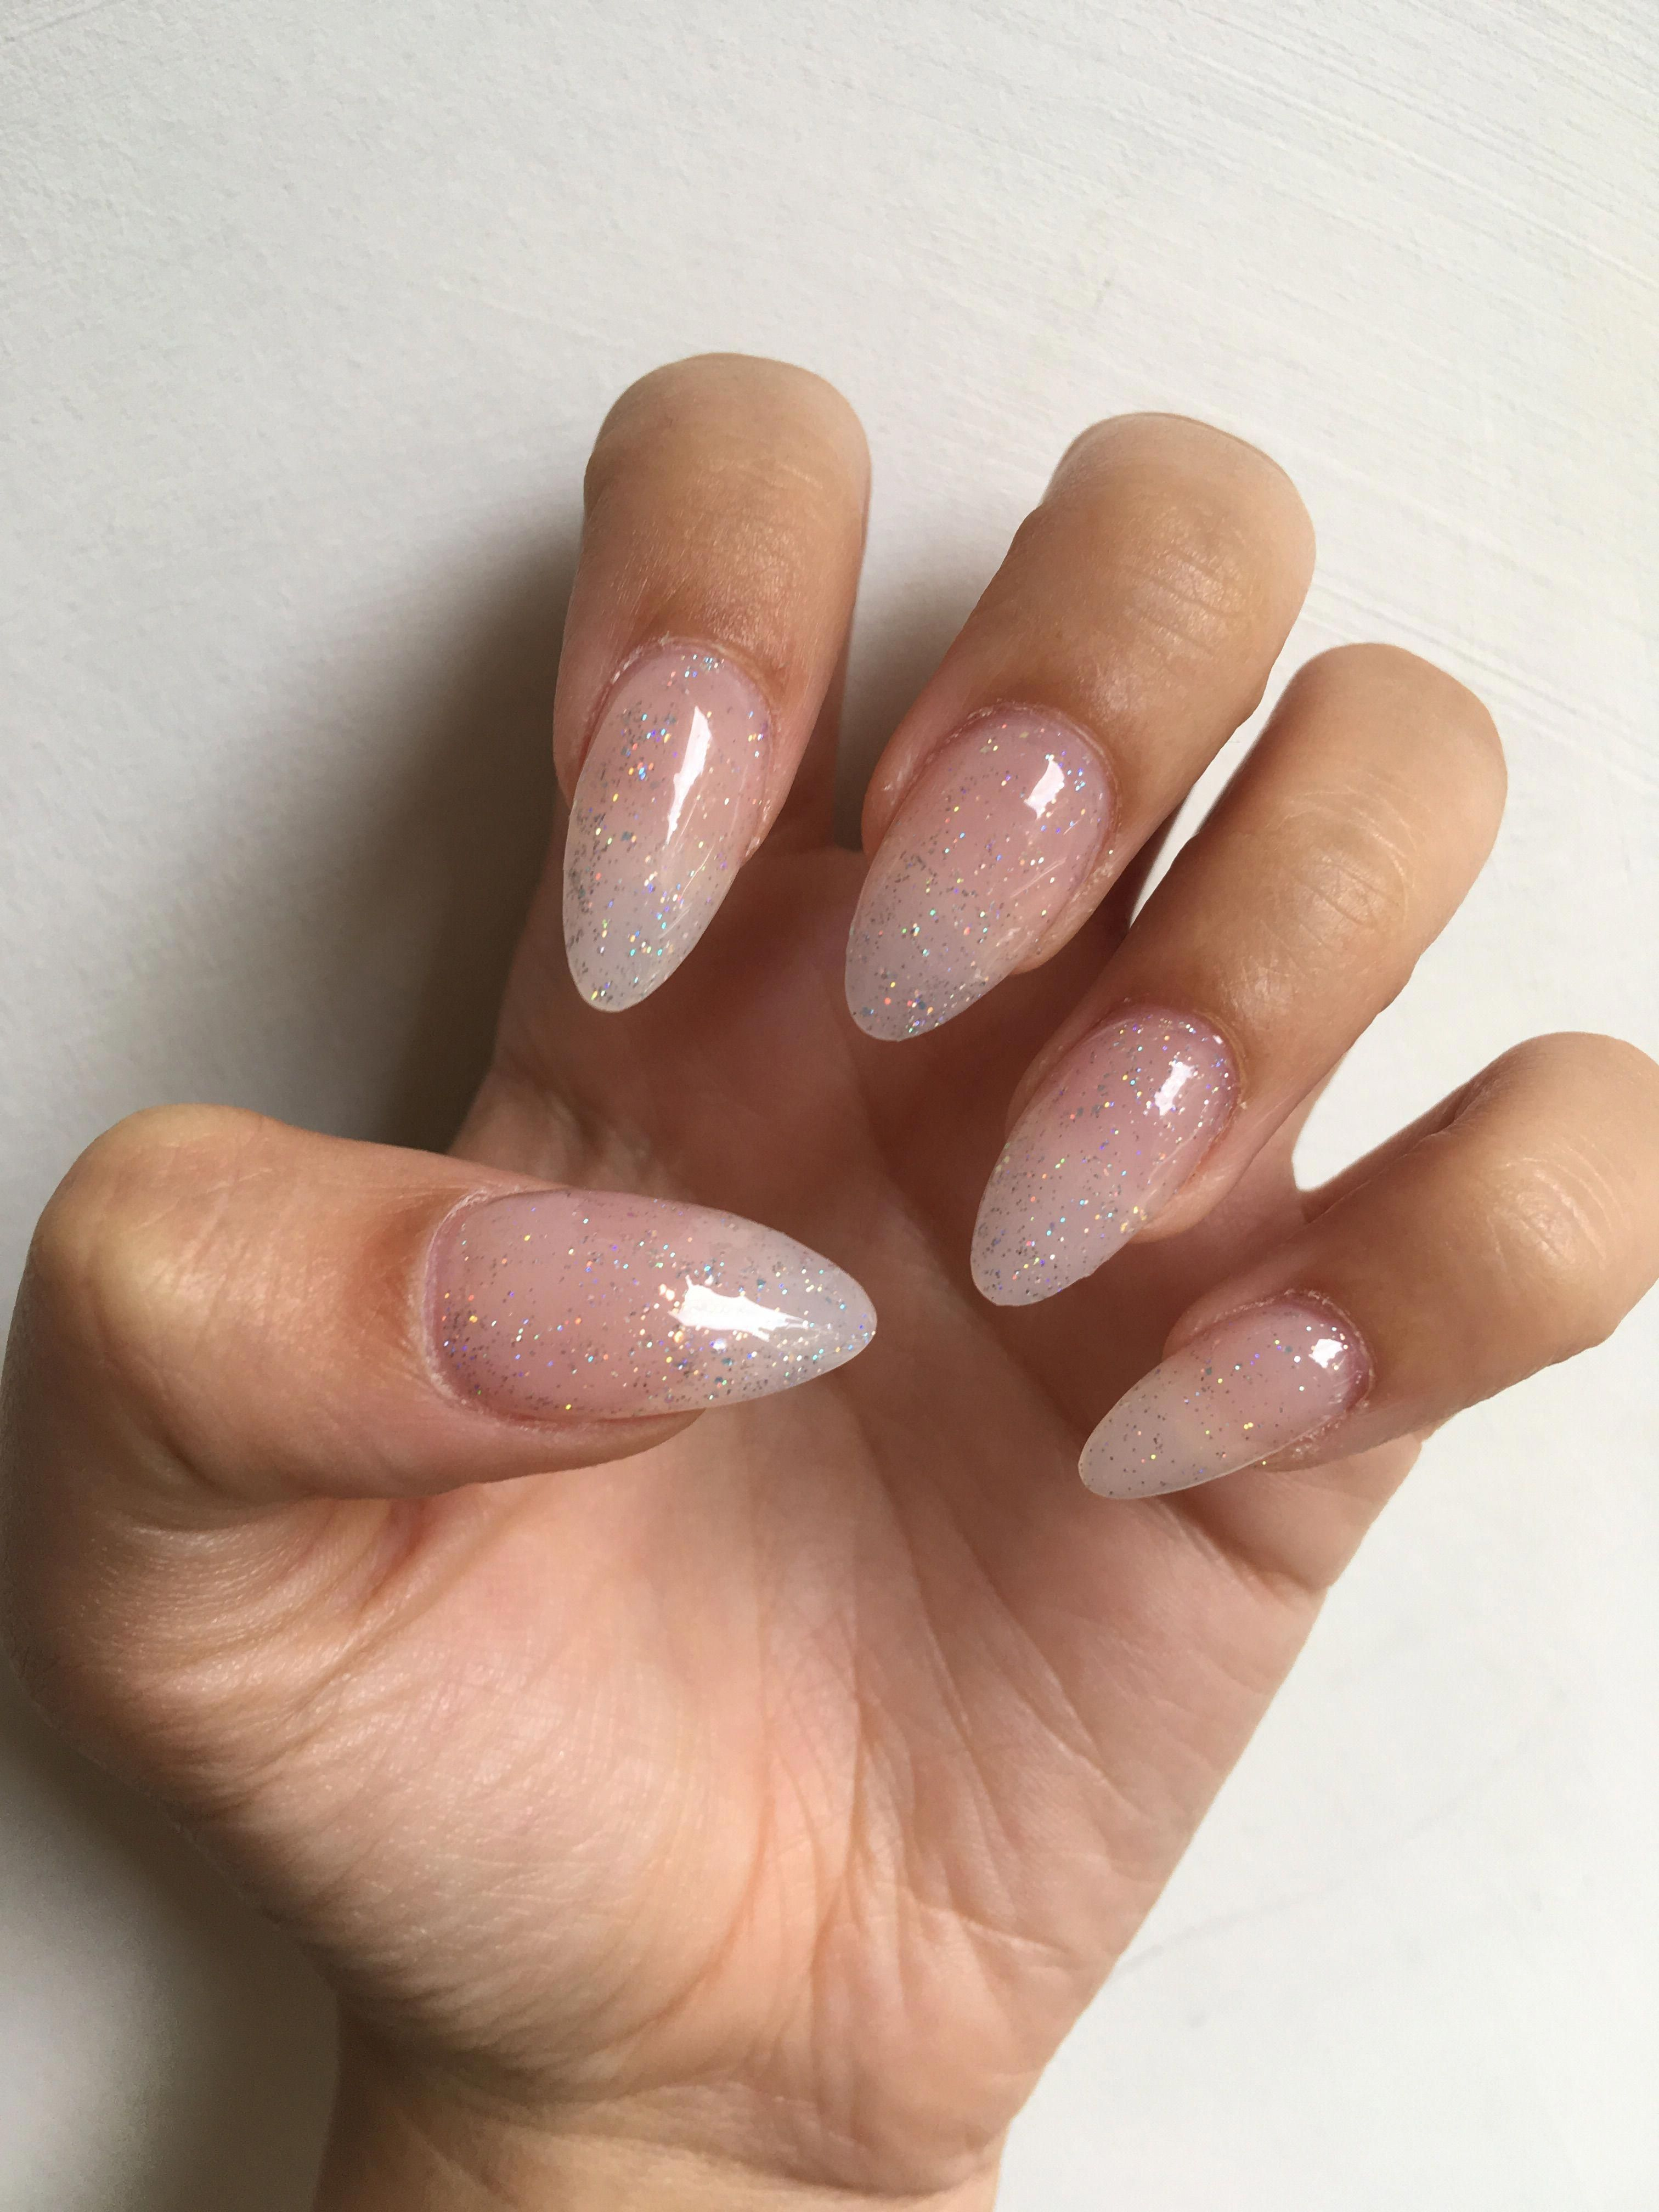 Glitter Nails Gelpolish In 2020 Clear Glitter Nails Almond Acrylic Nails Designs Almond Nails Designs